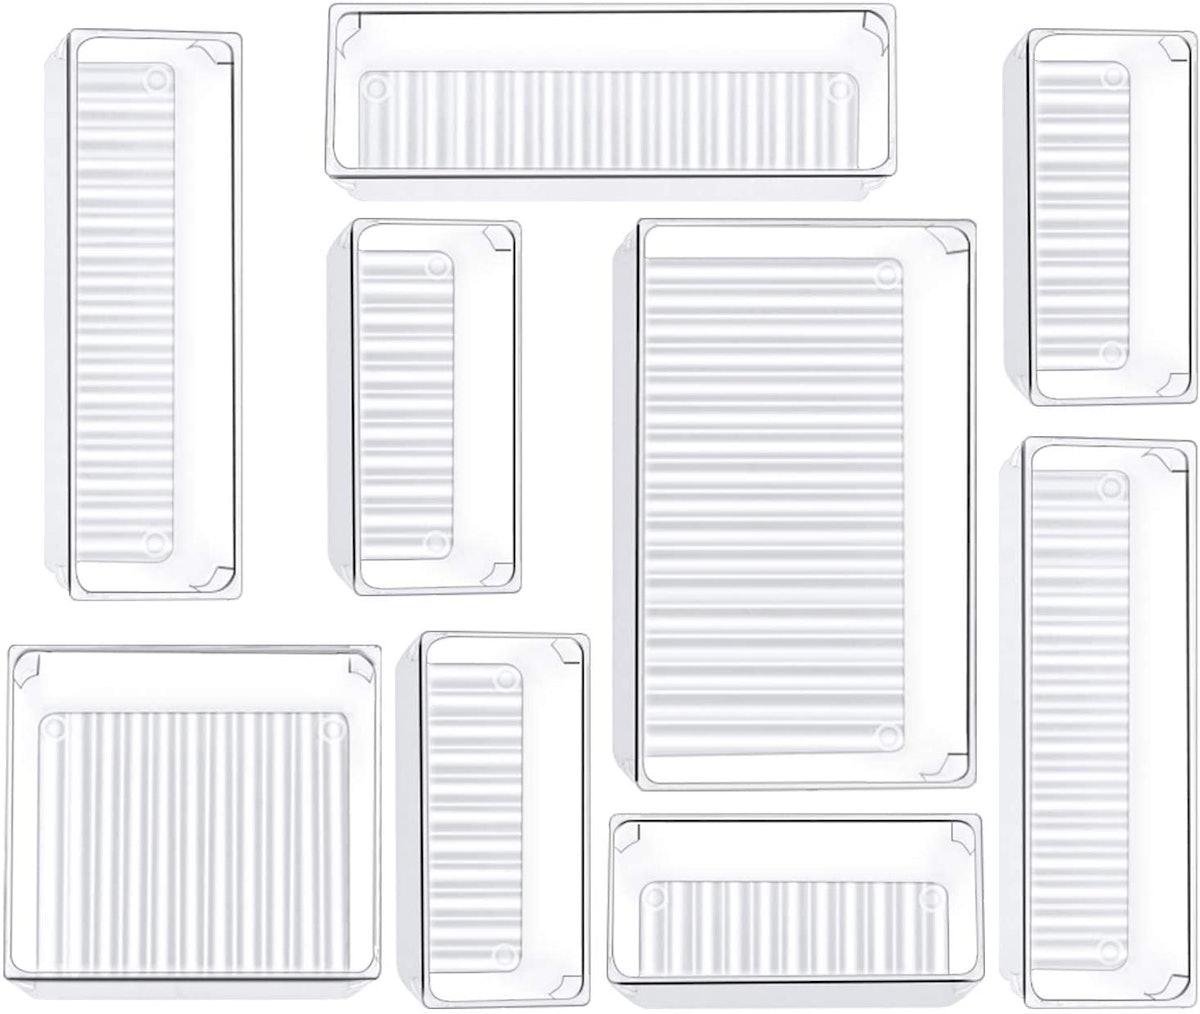 Kootek Drawer Organizer Trays (9 Pieces)